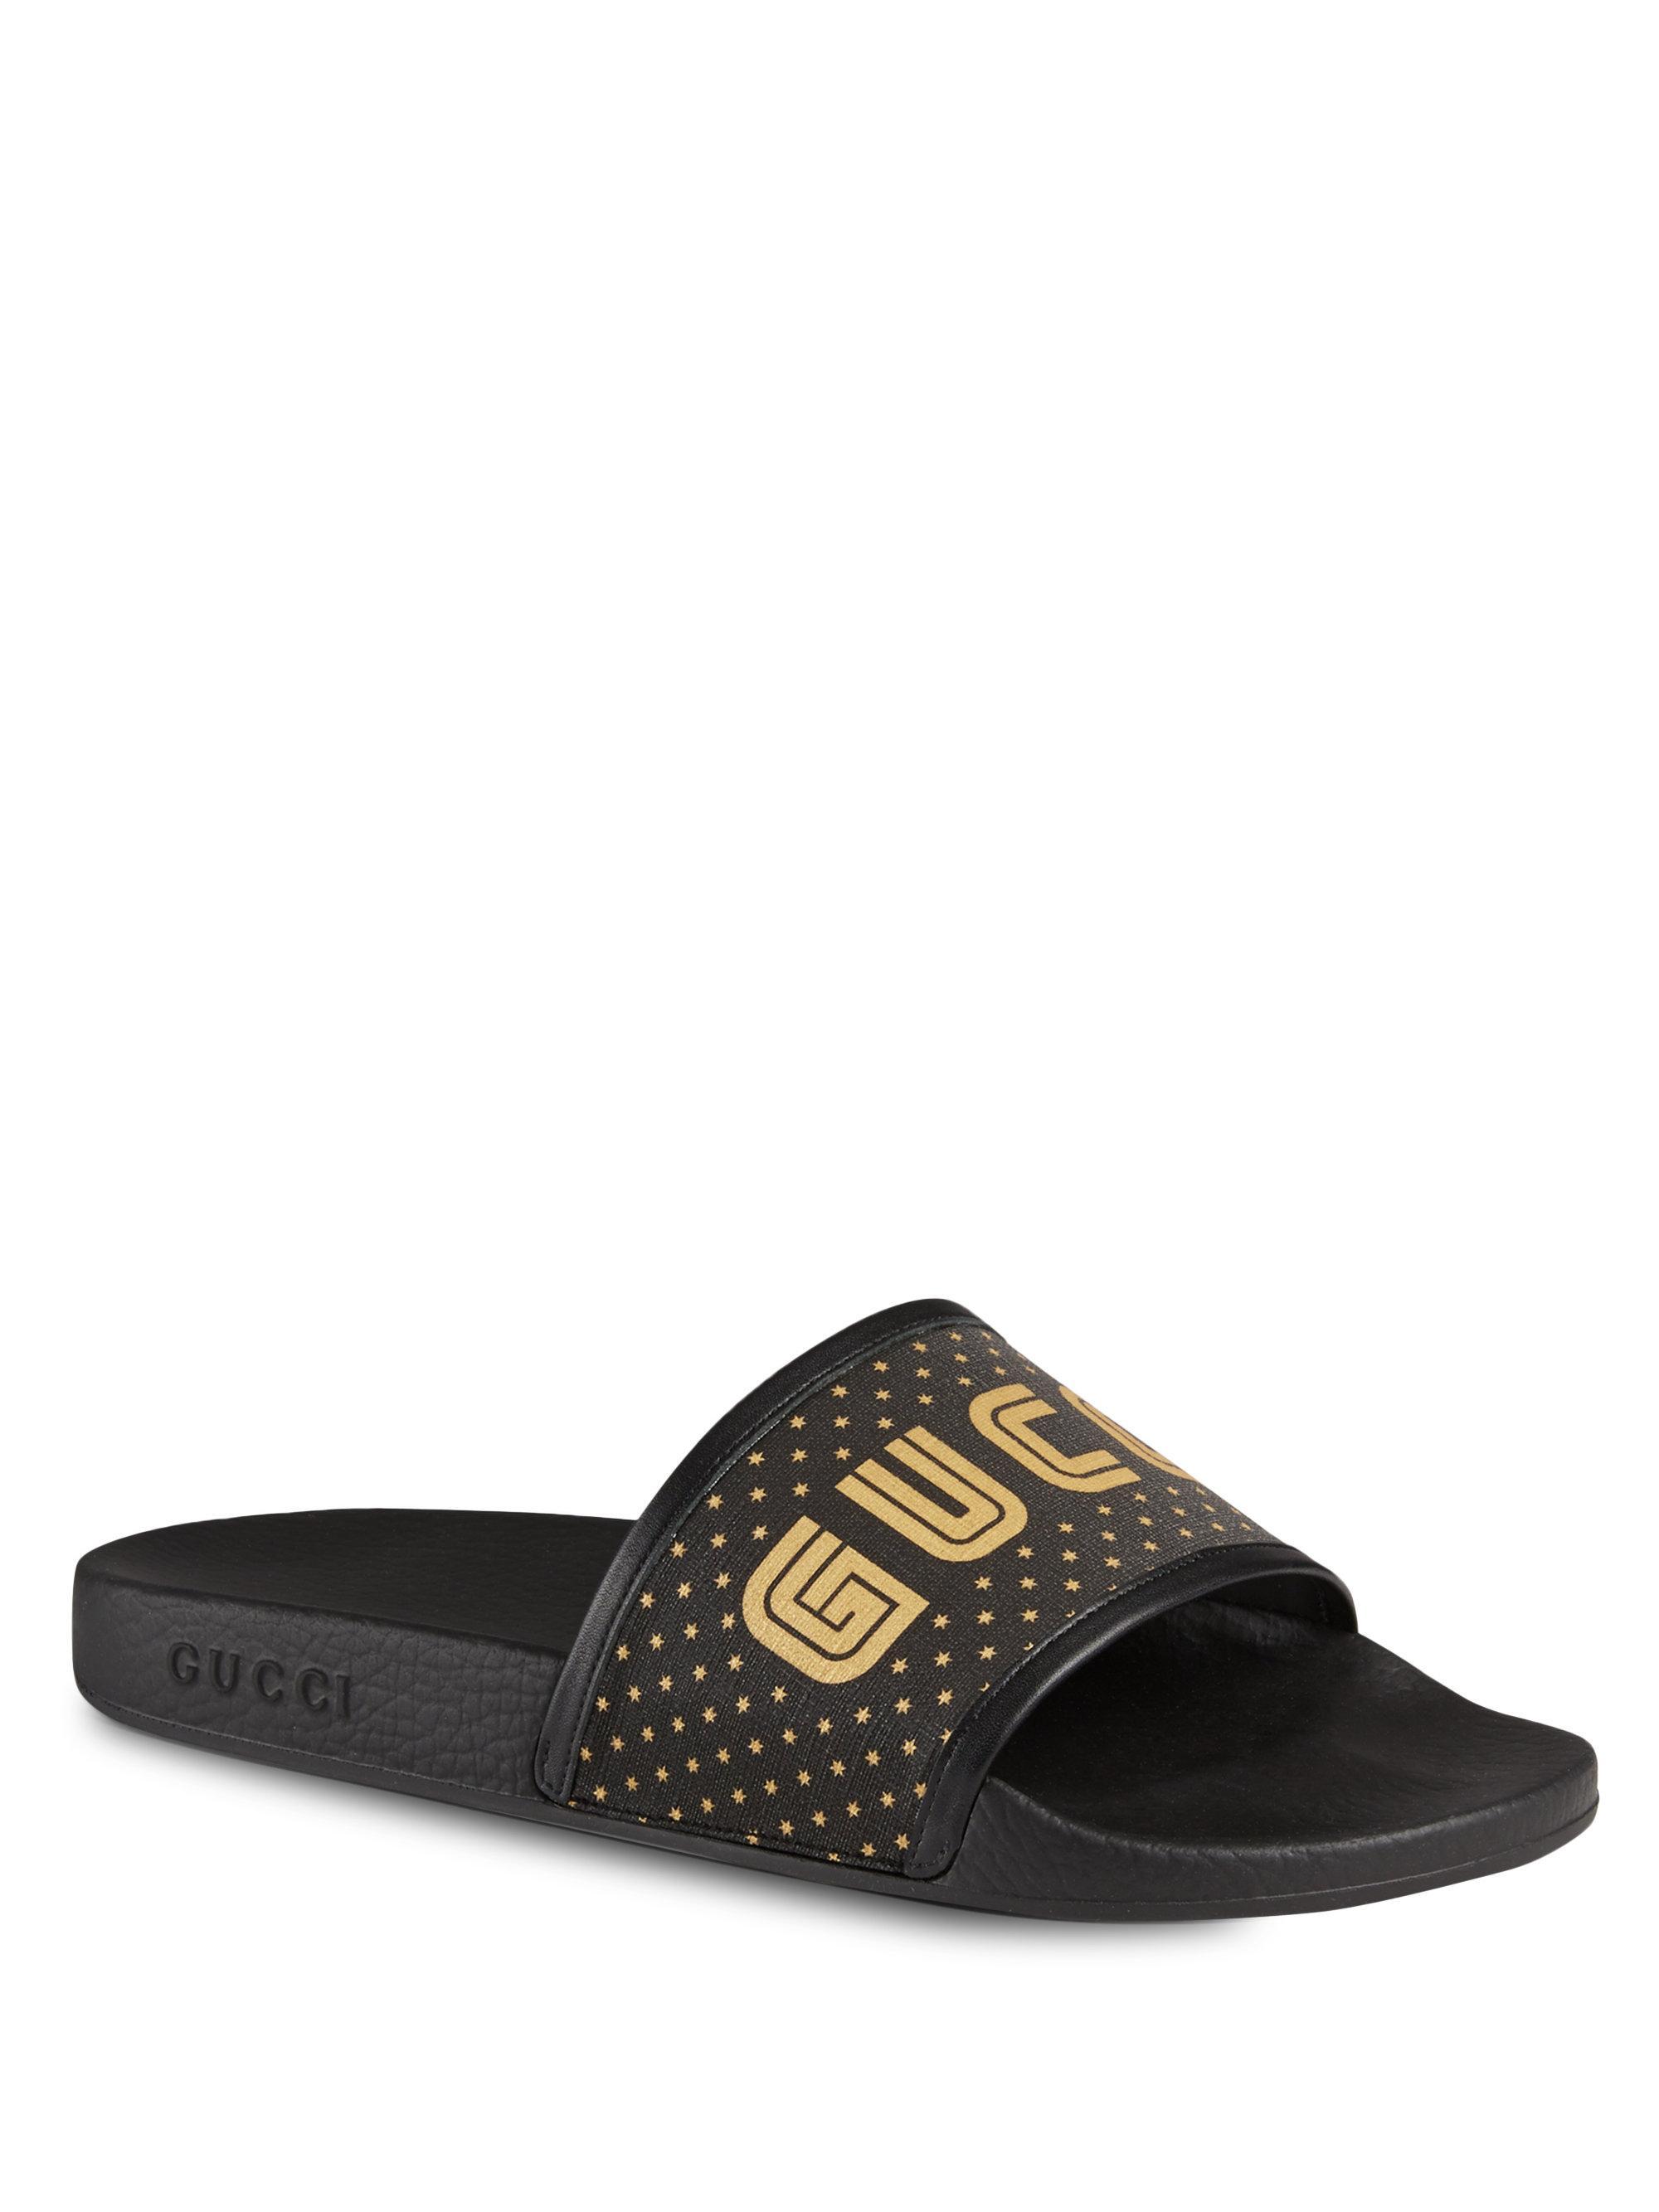 Sandals calfskin canvas Logo print black gold Gucci QU0tqY54p